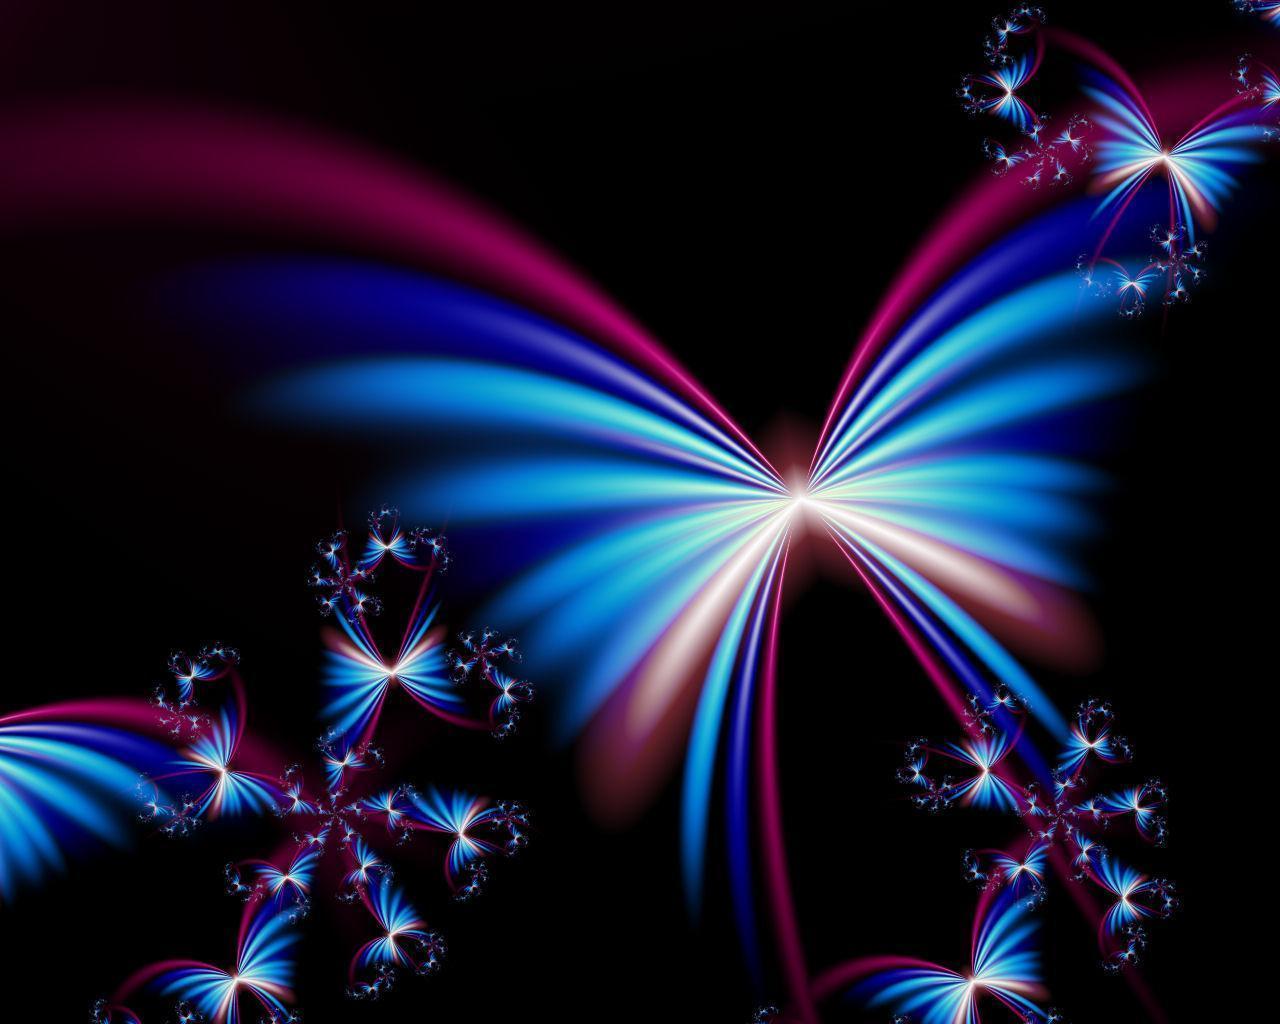 Free Butterfly Desktop Backgrounds - Wallpaper Cave  Free Butterfly ...